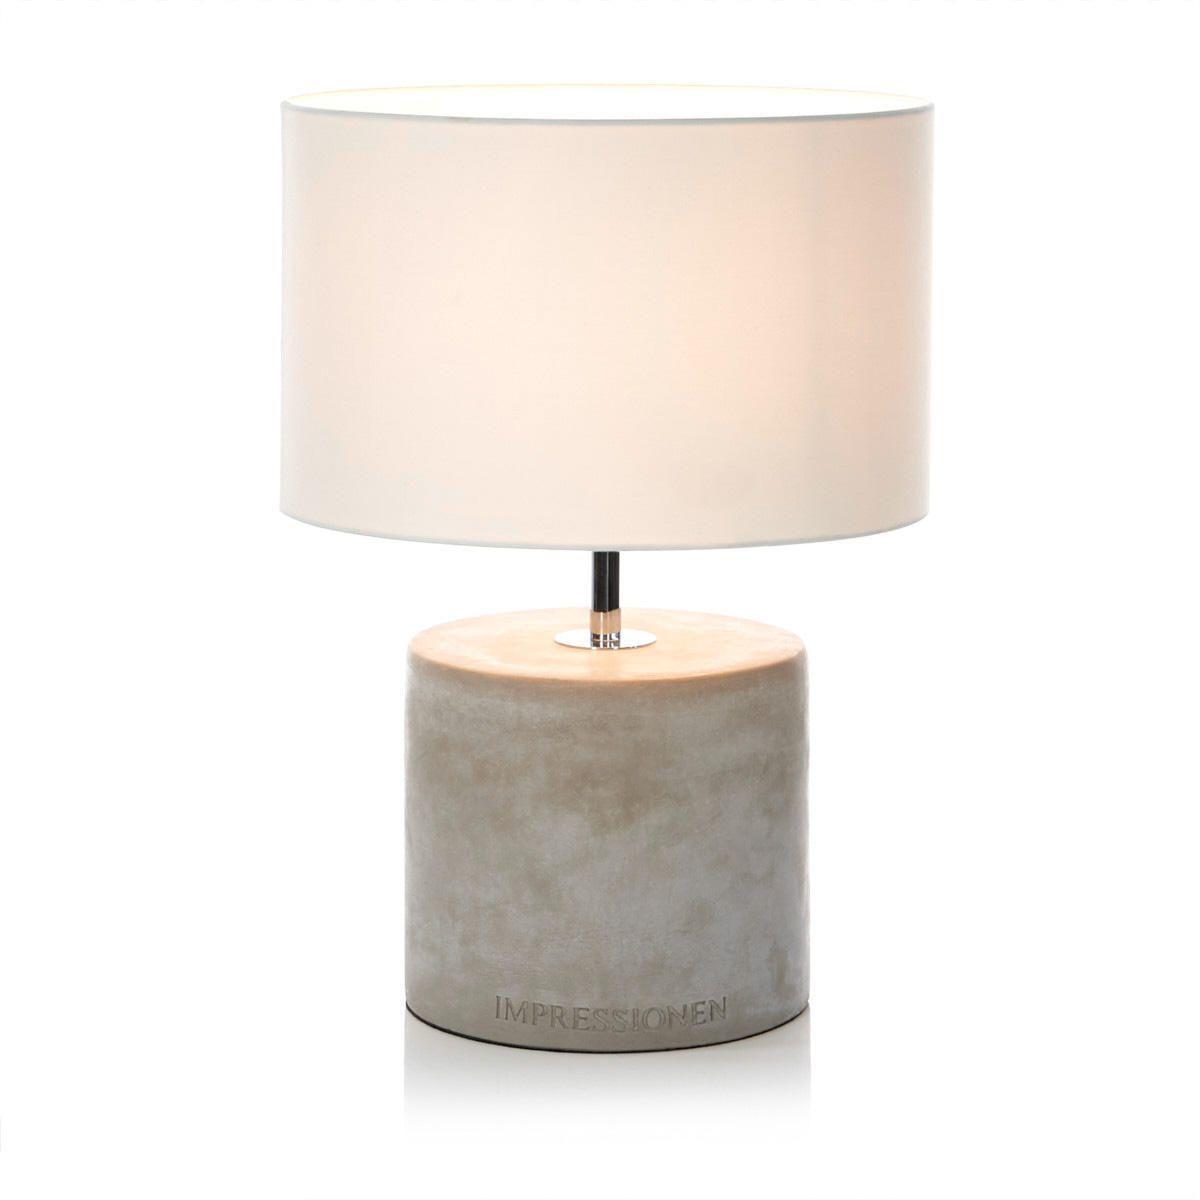 journelles maison die 20 sch nsten lampen aus den m bel onlineshops journelles. Black Bedroom Furniture Sets. Home Design Ideas